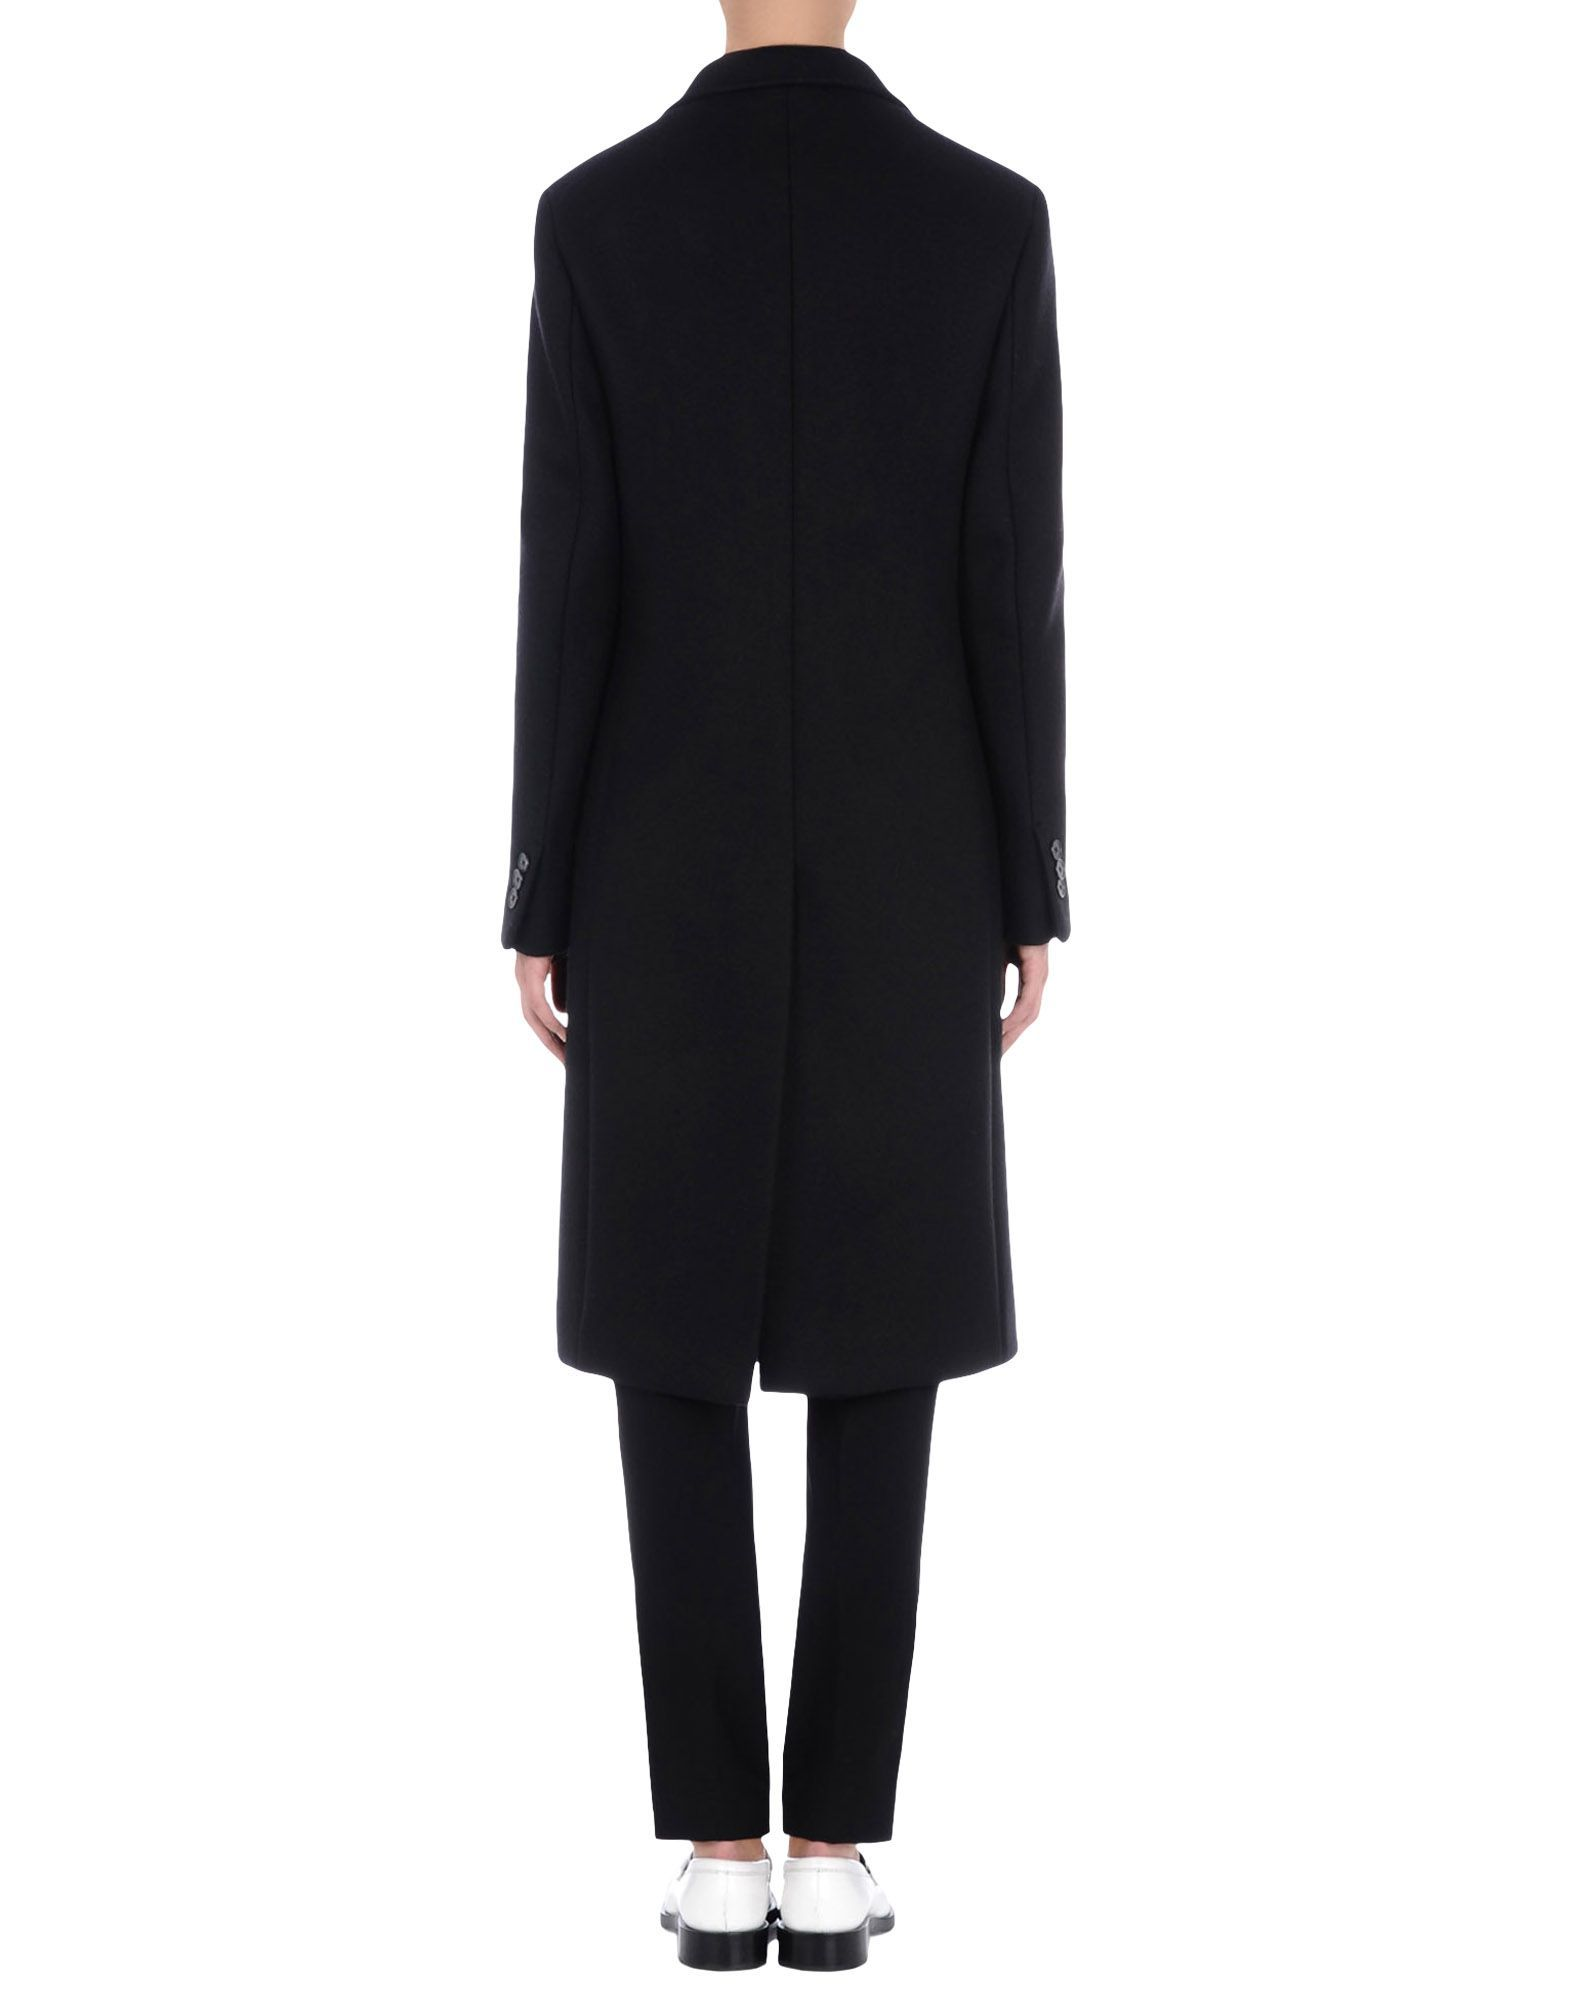 Jil Sander Black Double Breasted Overcoat